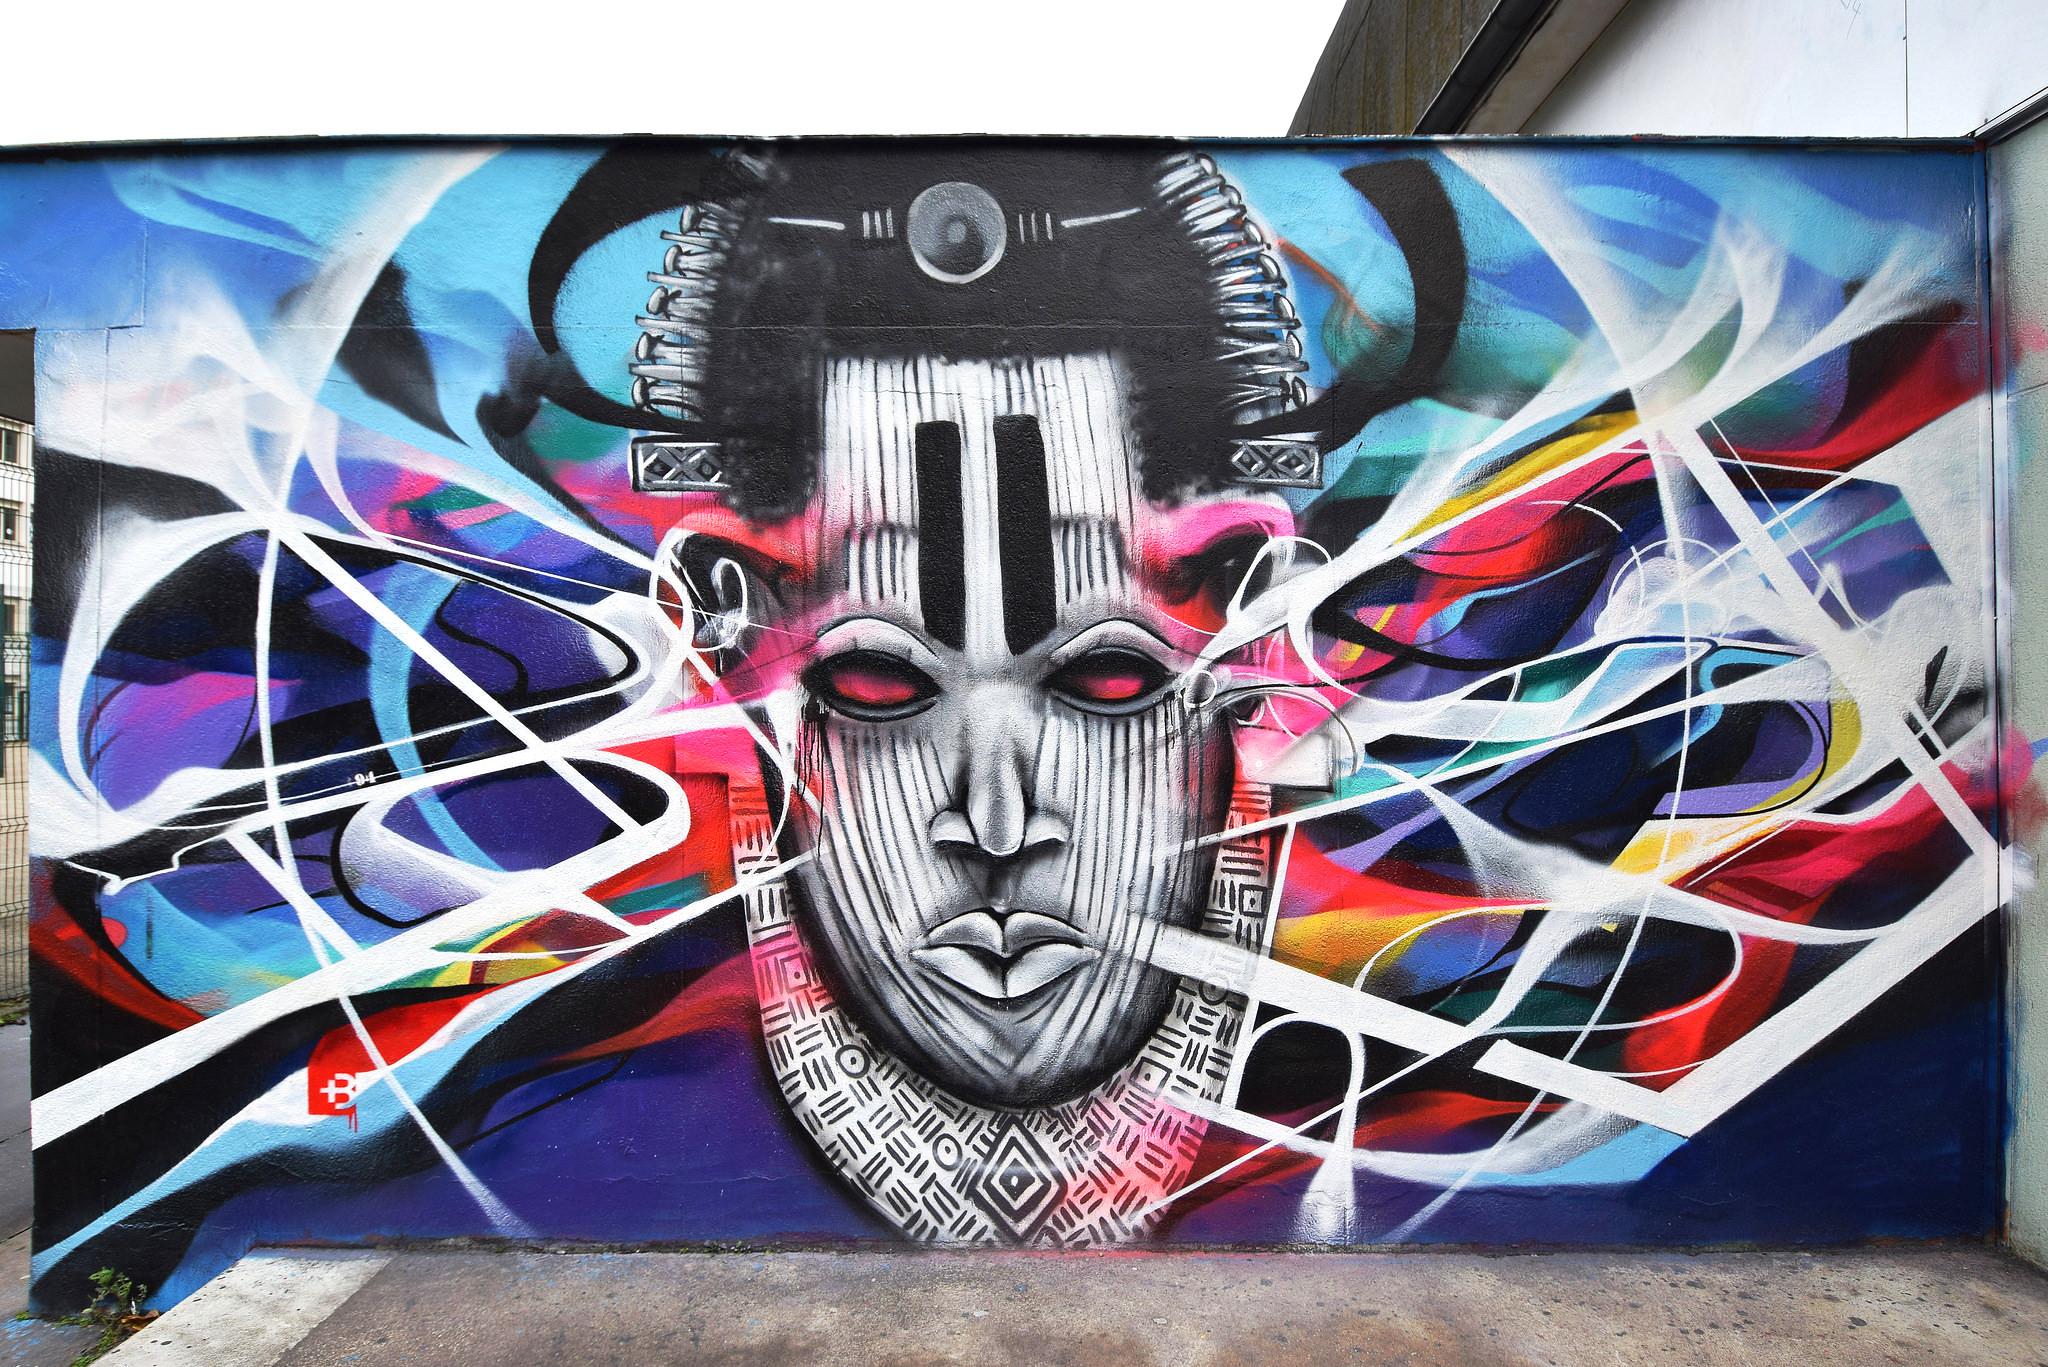 Smi bandi voodoo post graffiti